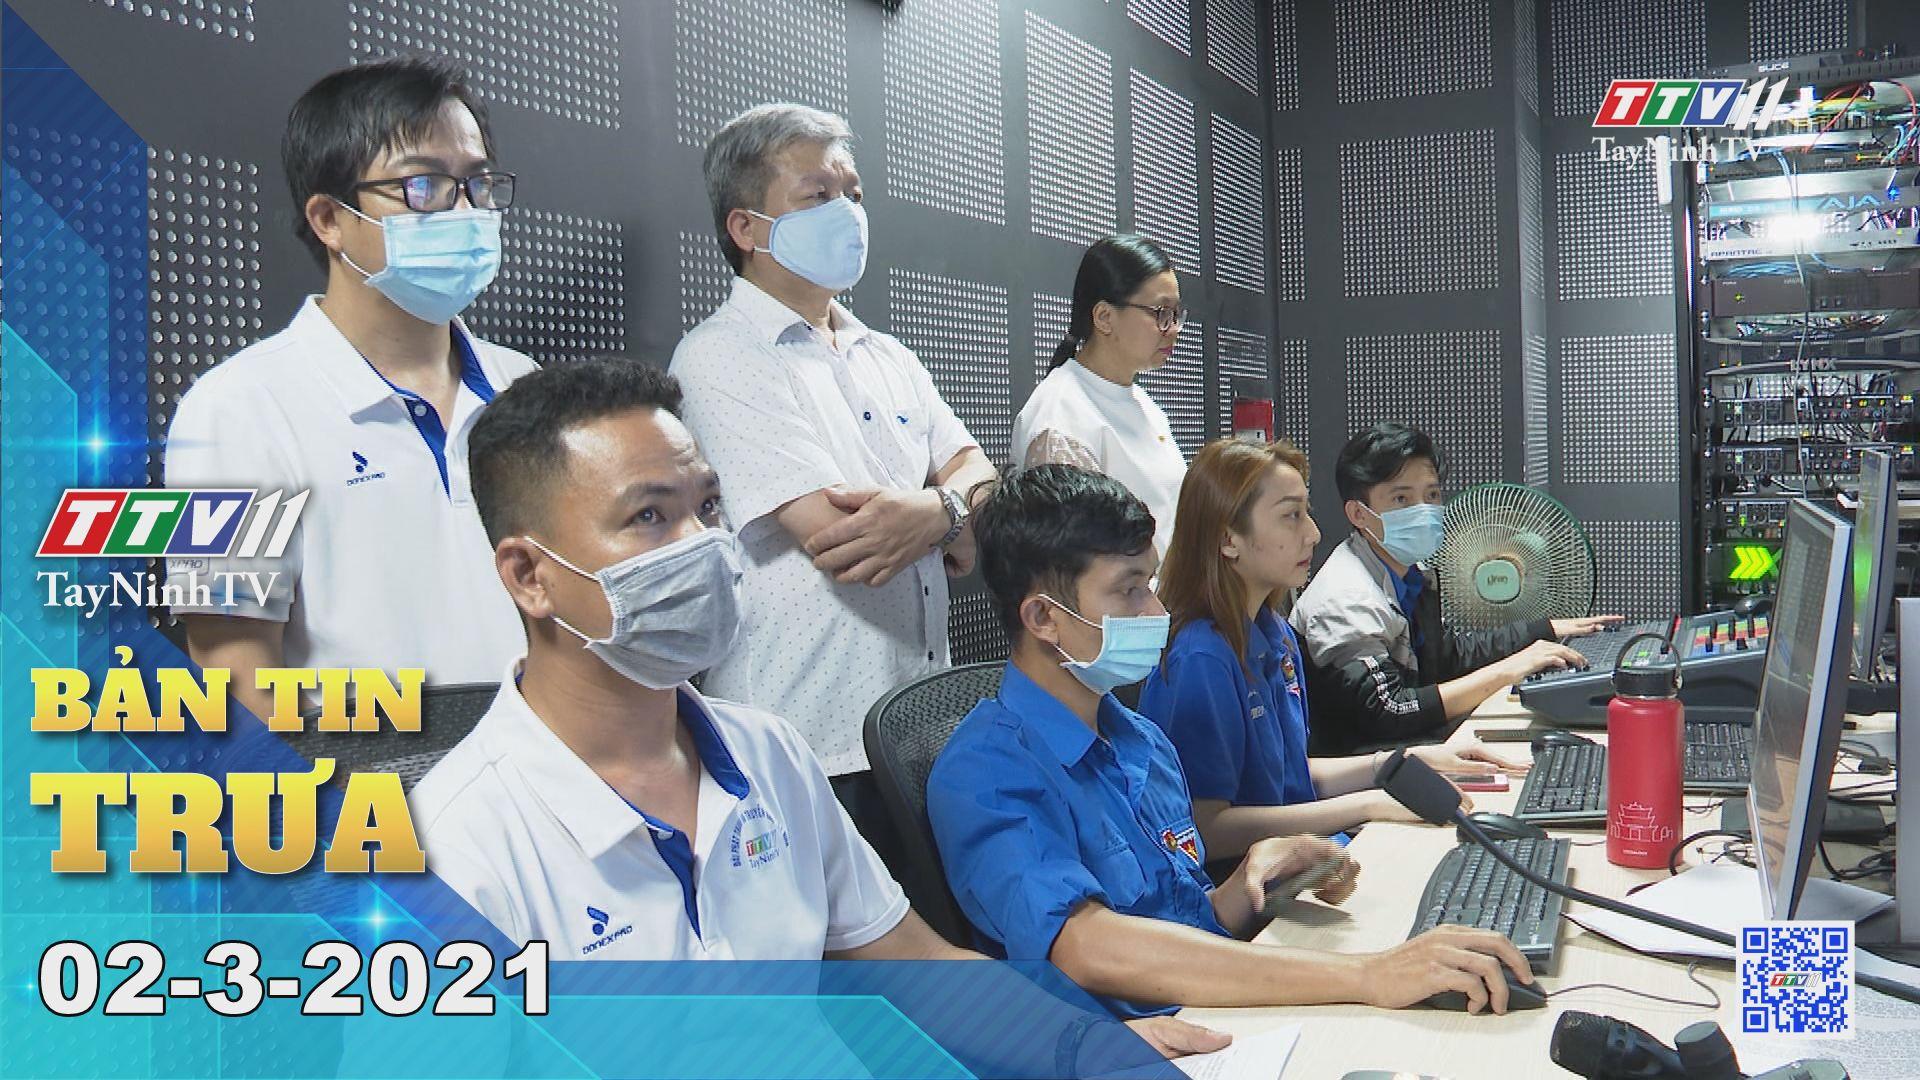 Bản tin trưa 02-3-2021 | Tin tức hôm nay | TayNinhTV